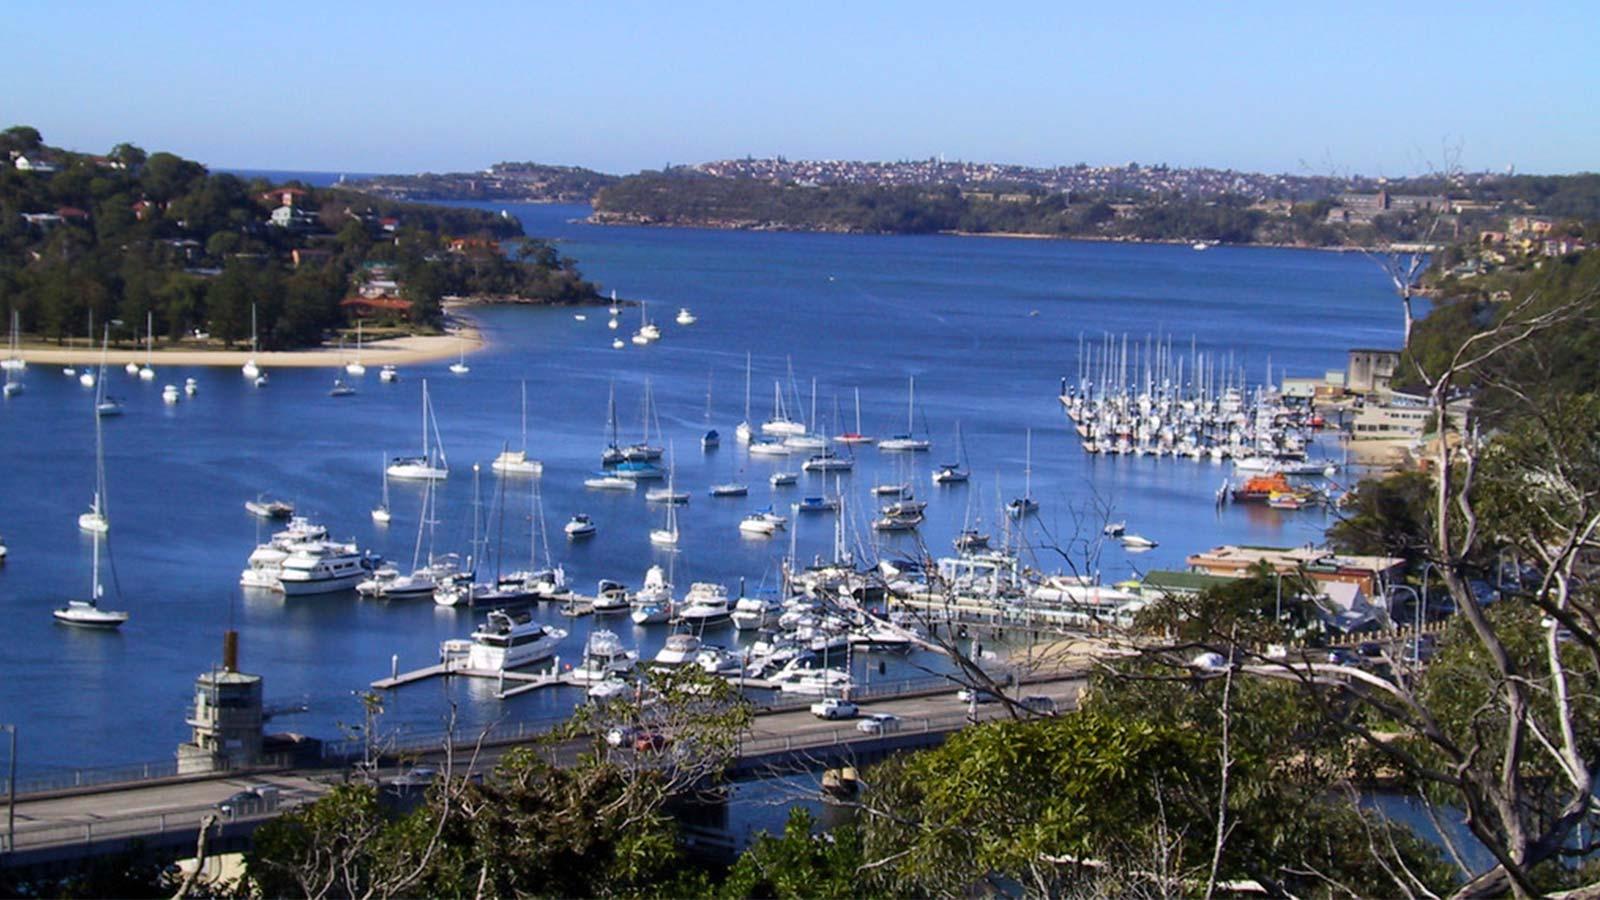 Sydney Lookout